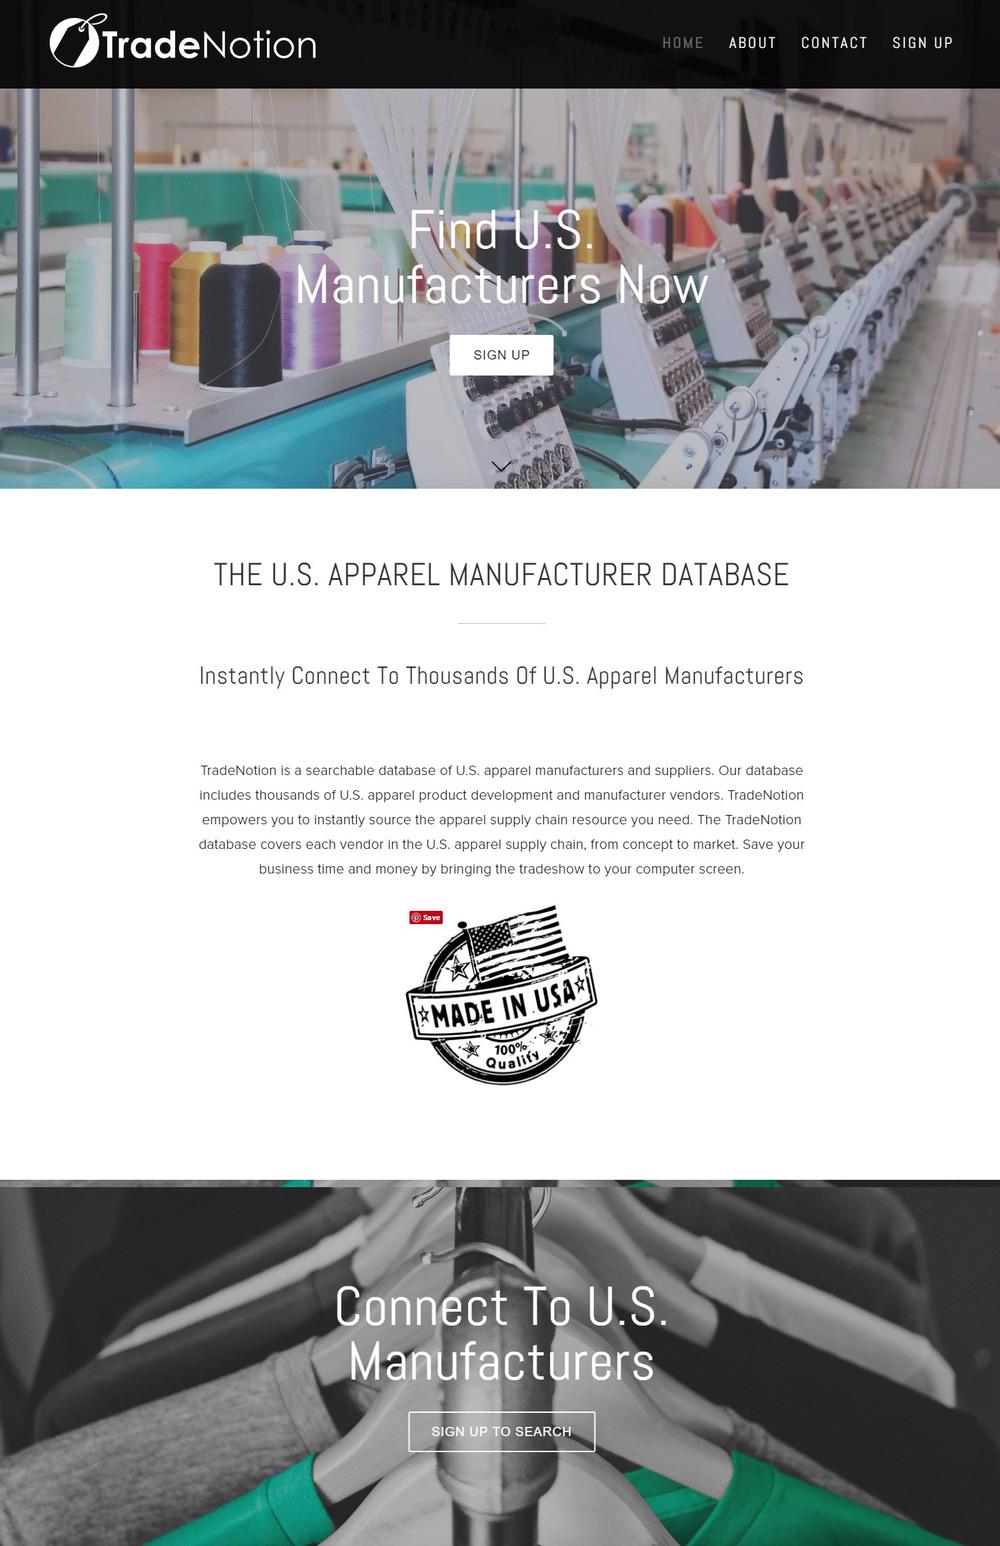 TradeNotion Patrick Judge Website Design Bend Oregon